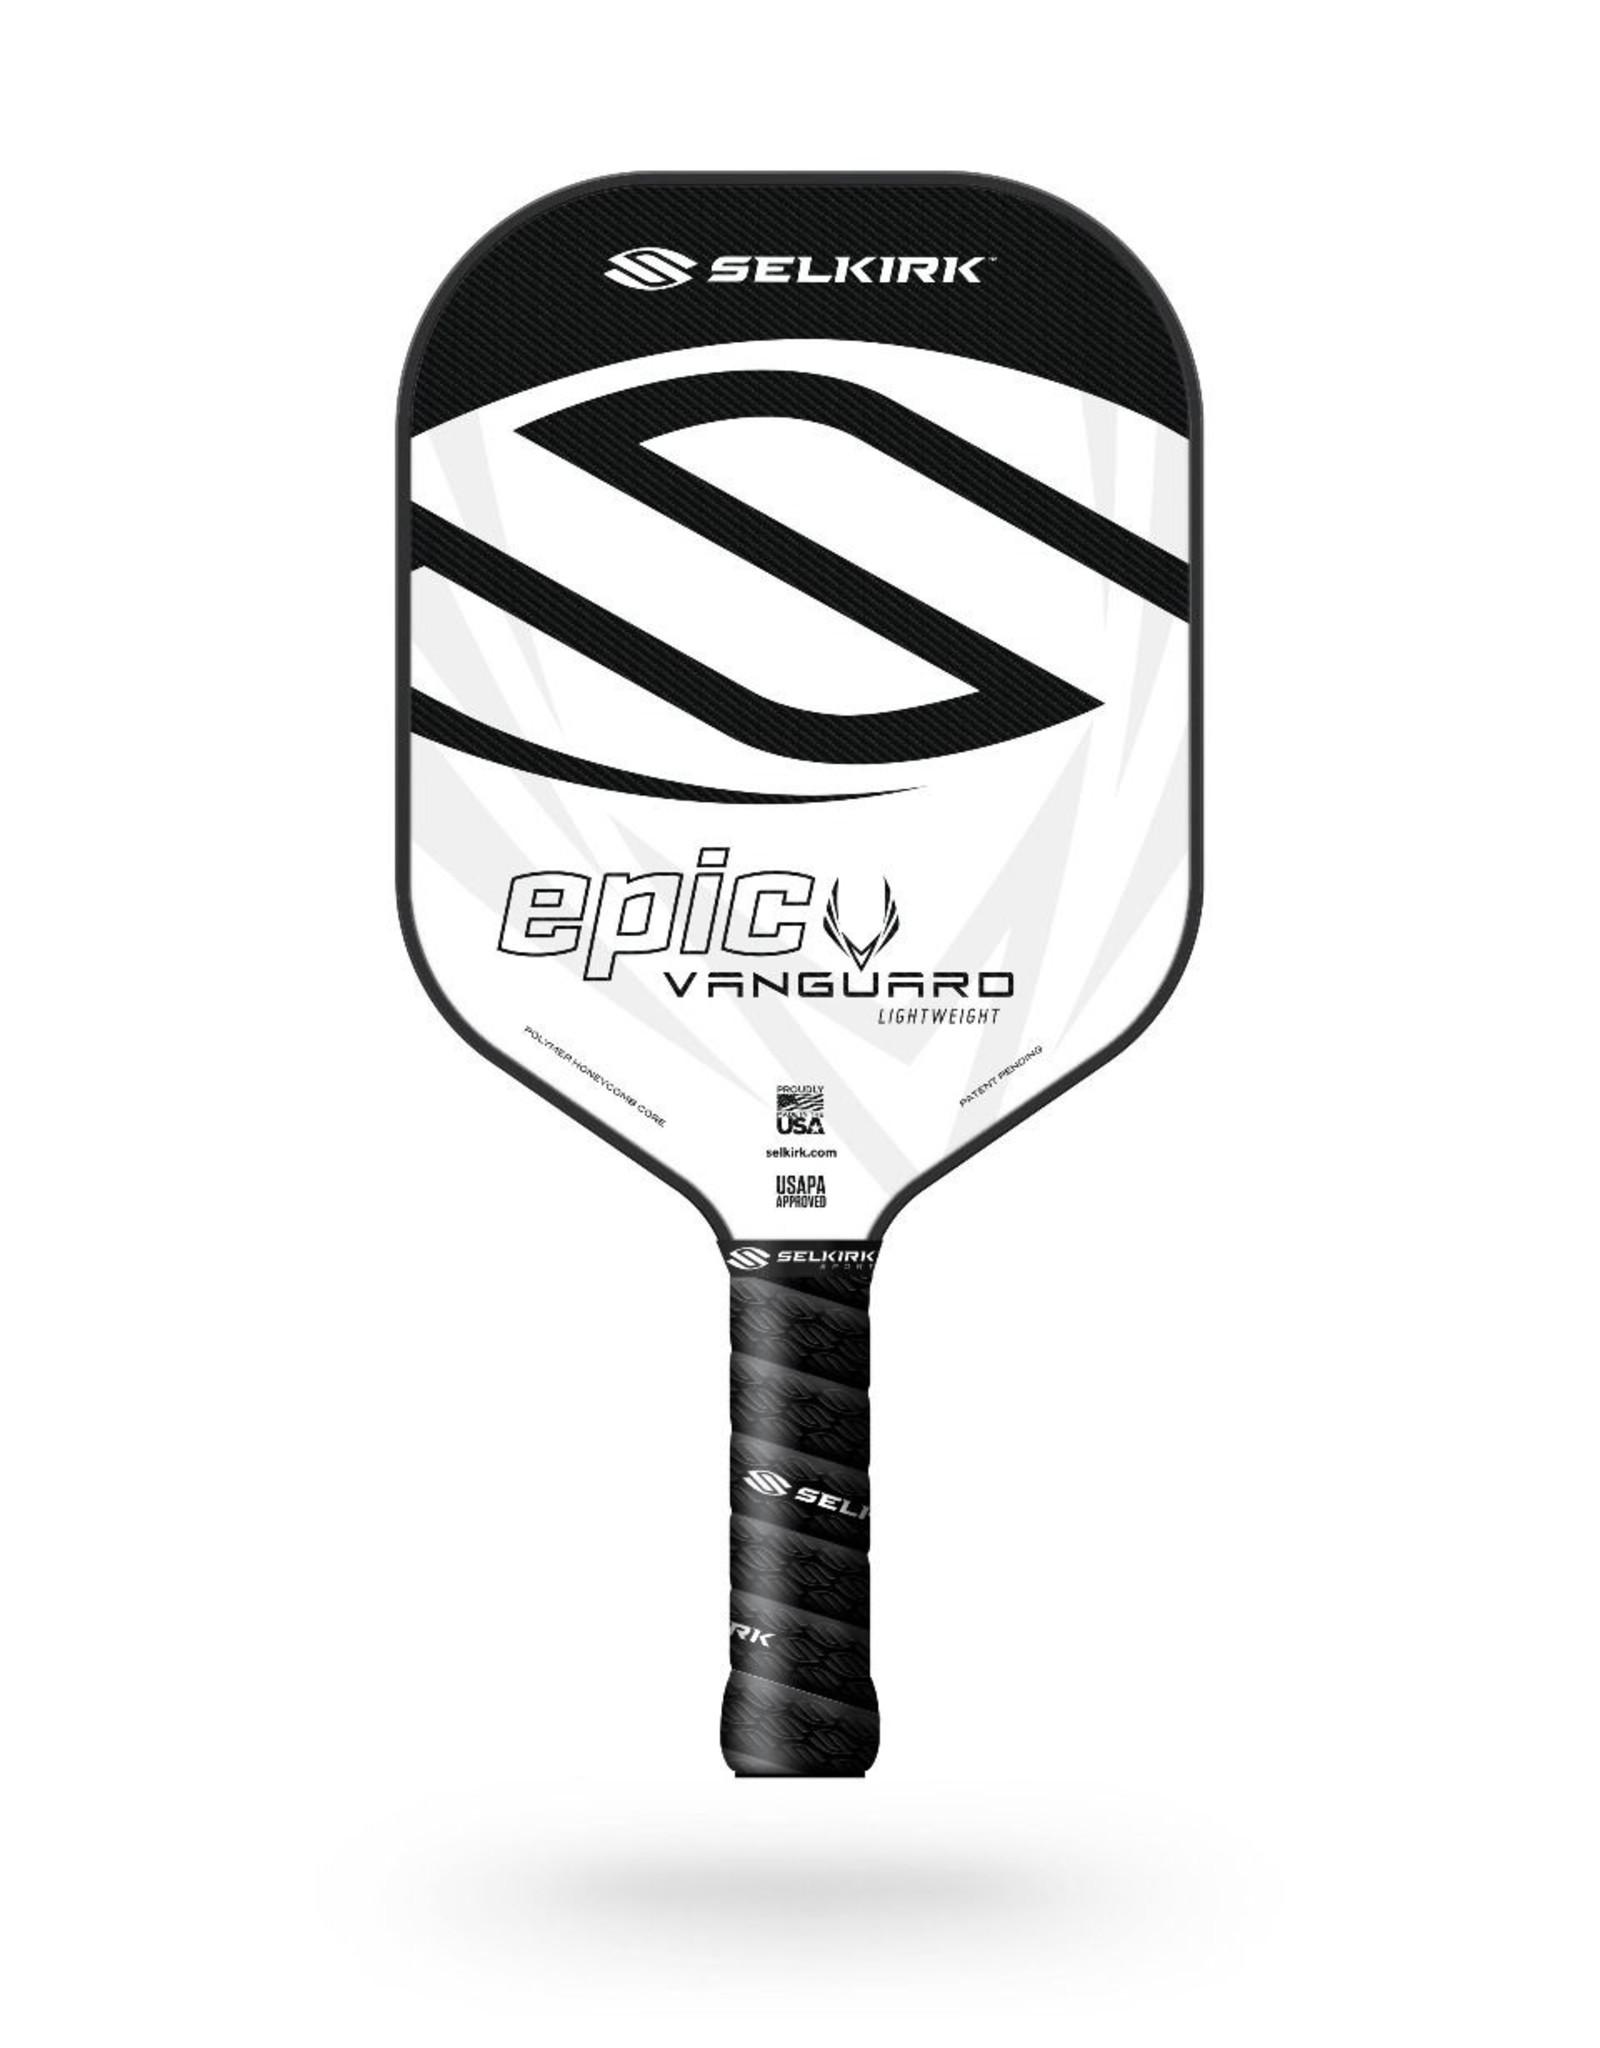 Selkirk Selkirk  Vanguard Hybrid Epic Lightweight Black Frost